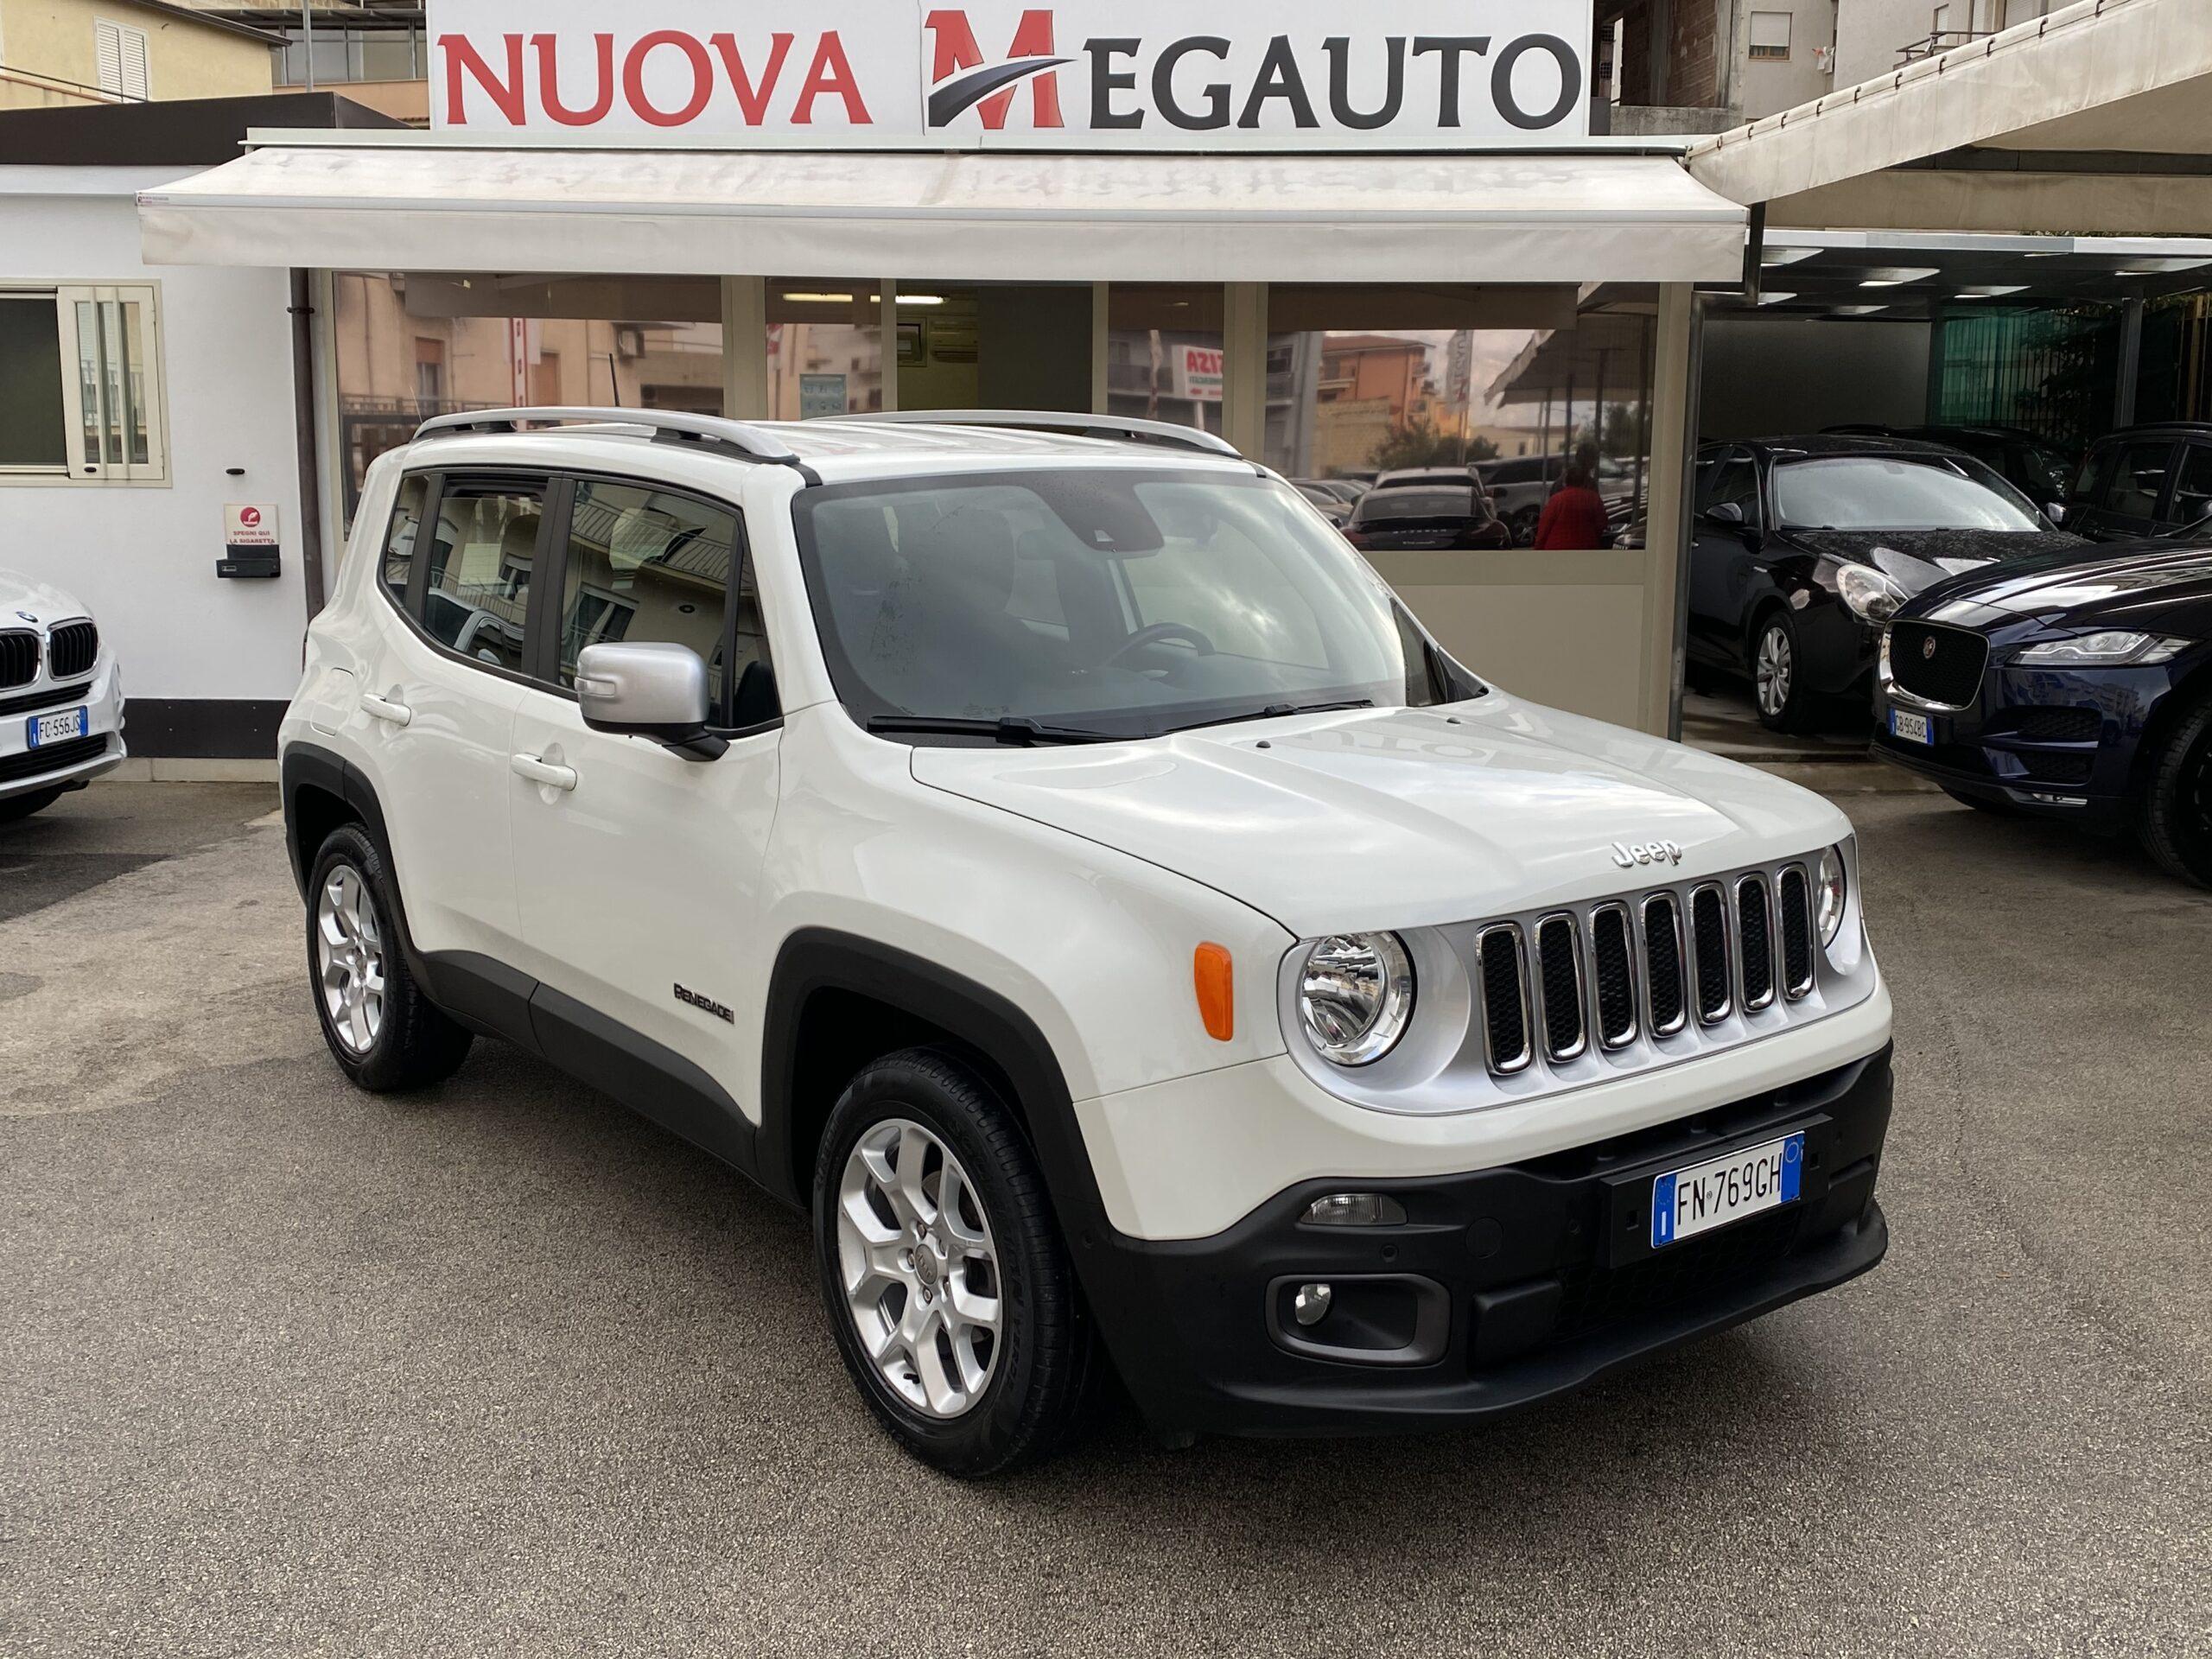 Jeep Renegade 1.6 Mjt 120 CV Limited 2018